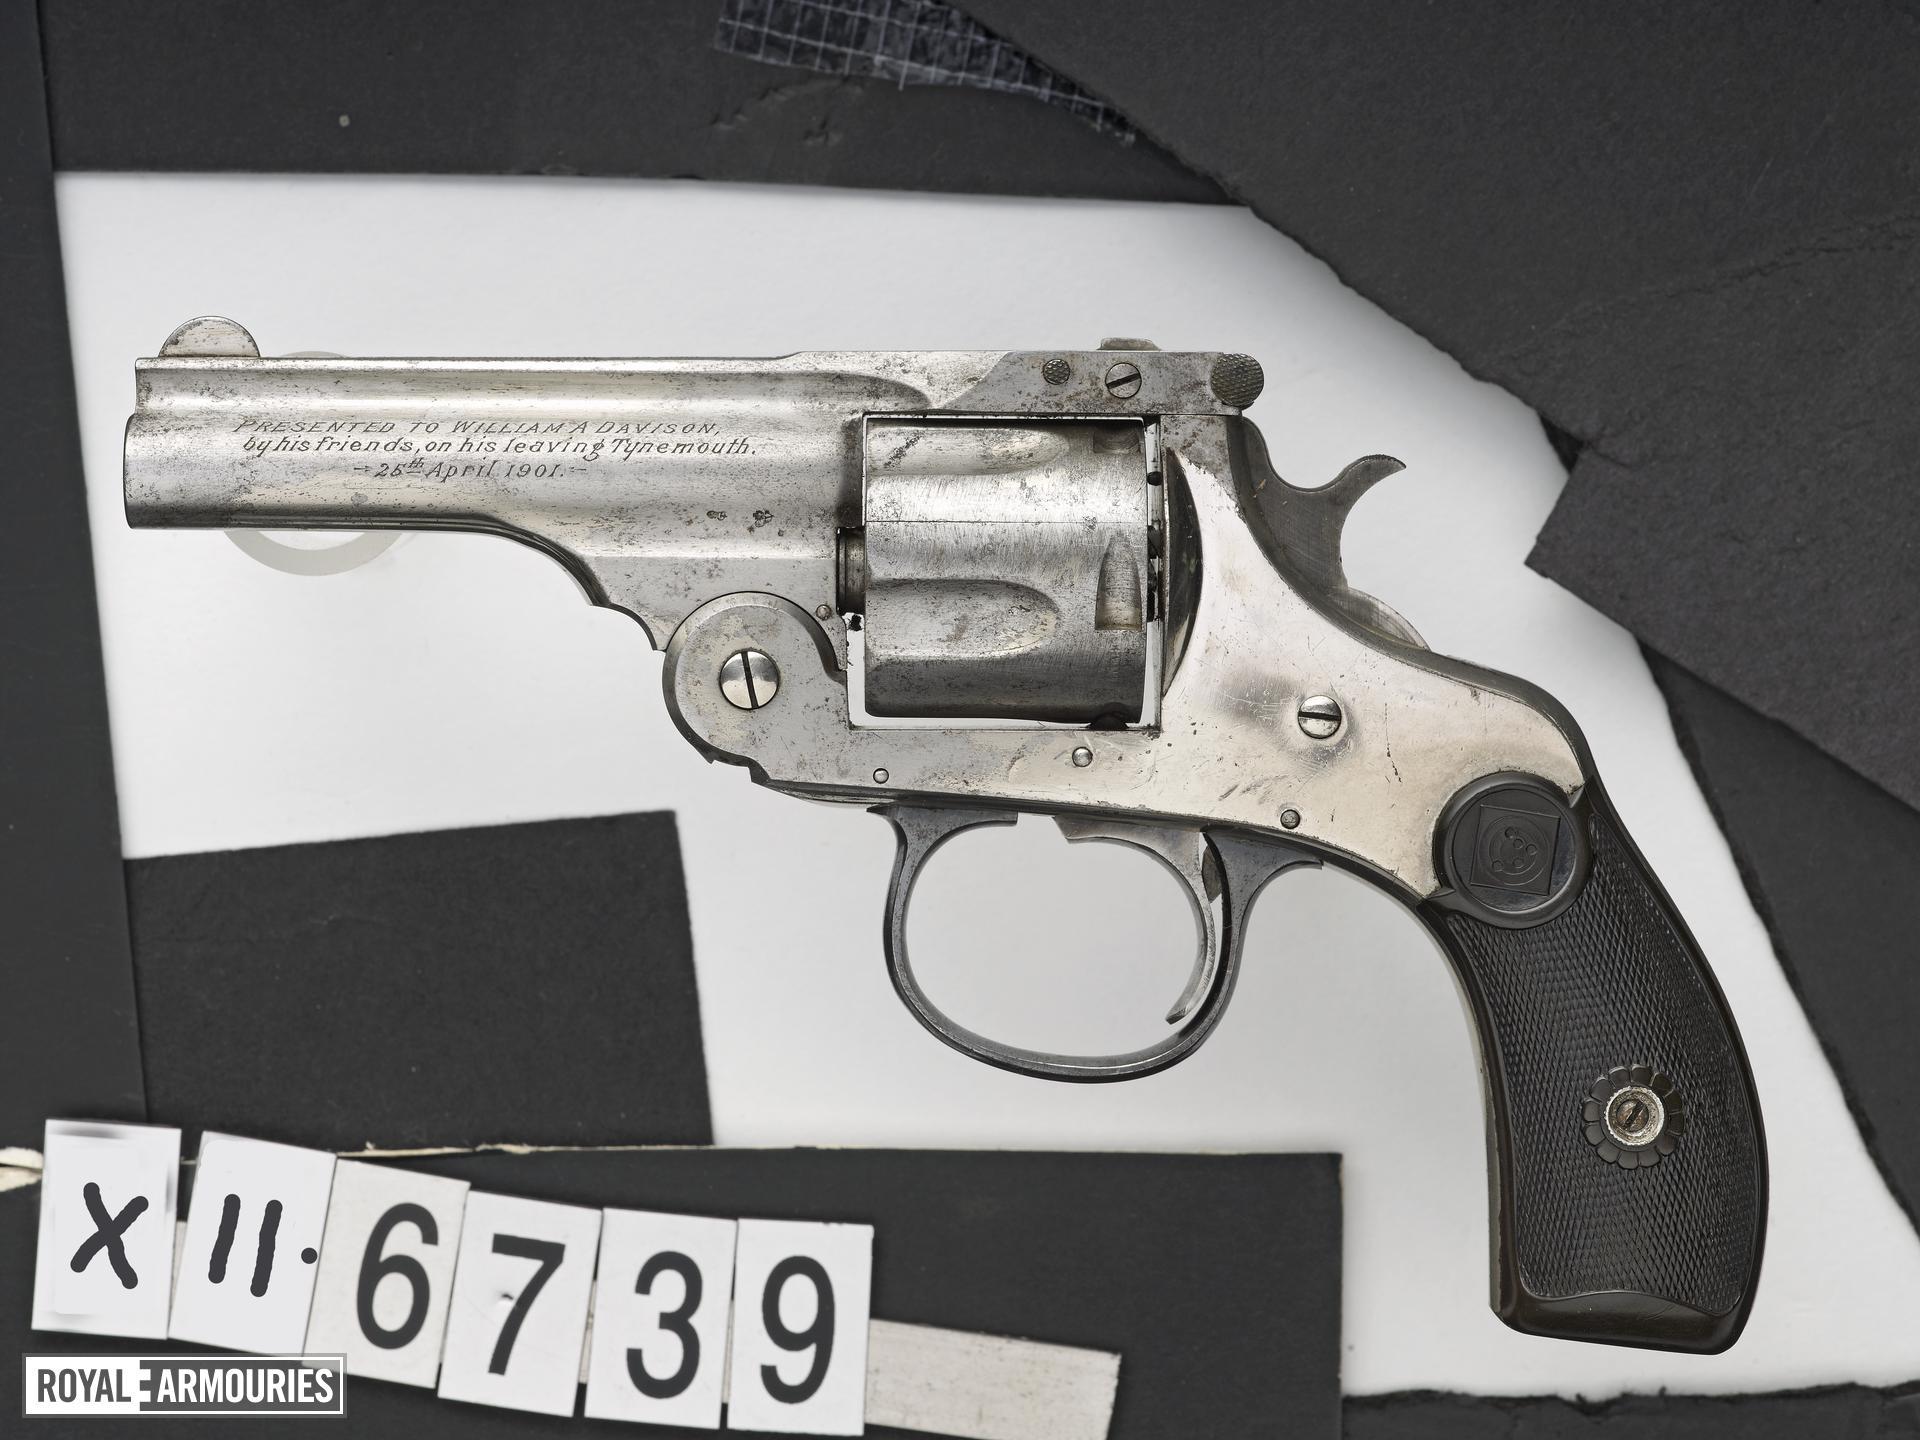 Centrefire six-shot revolver - Harrington and Richardson